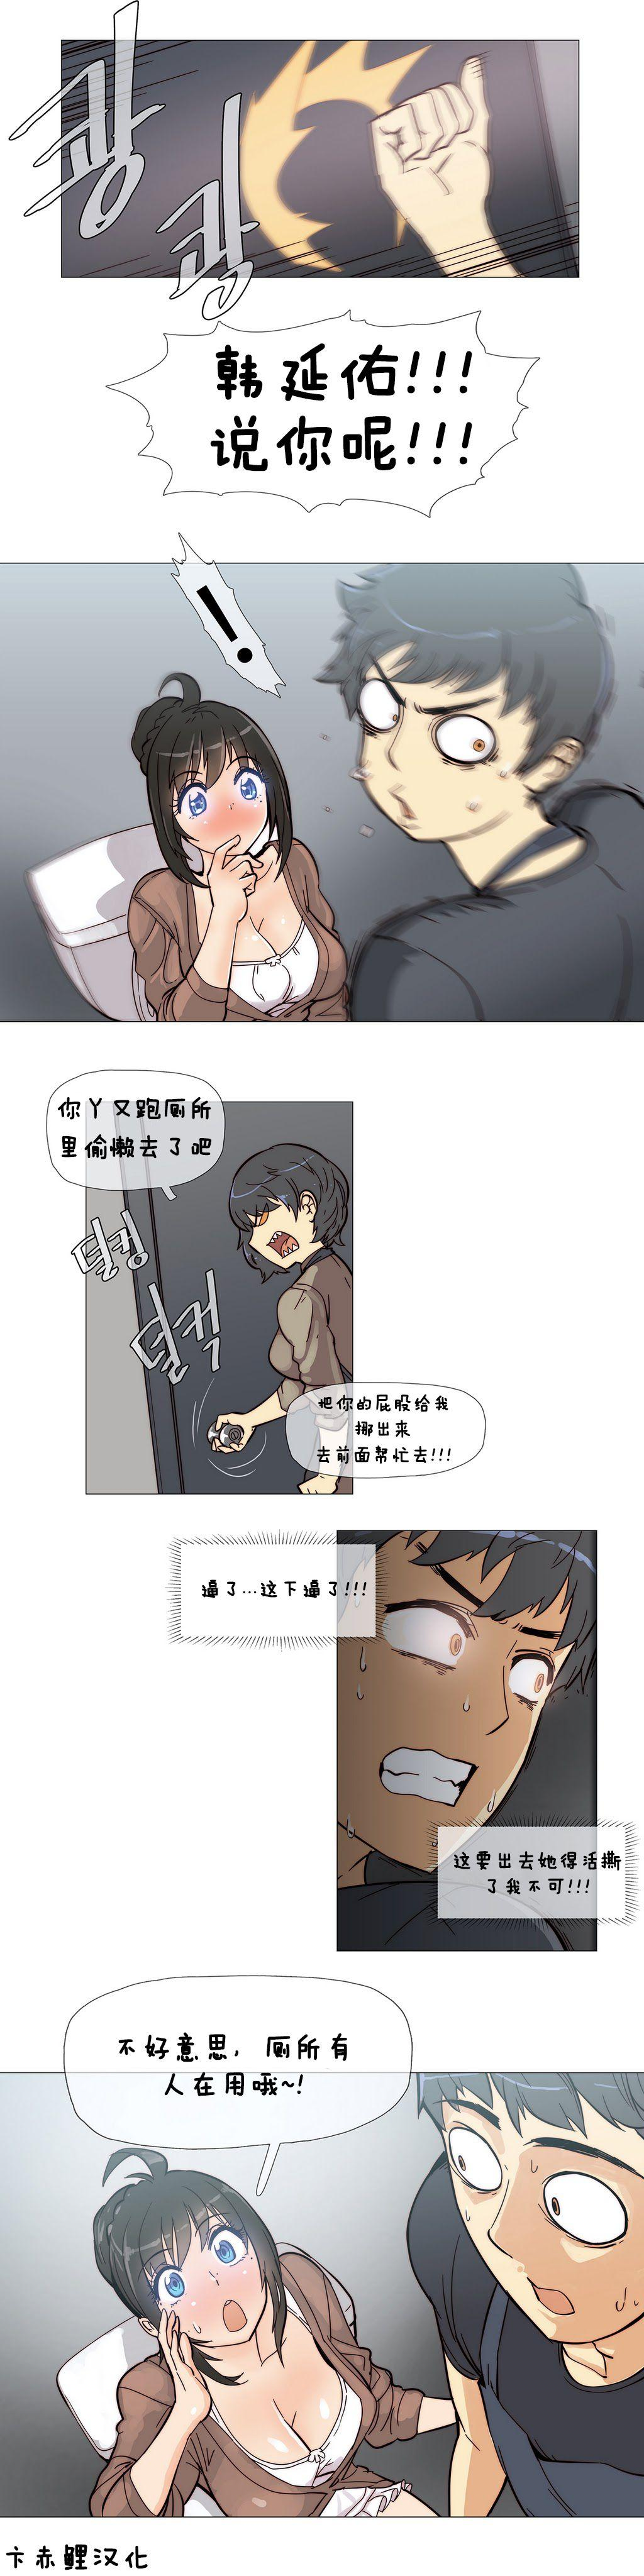 HouseHold Affairs 【卞赤鲤个人汉化】1~21话(持续更新中) 75